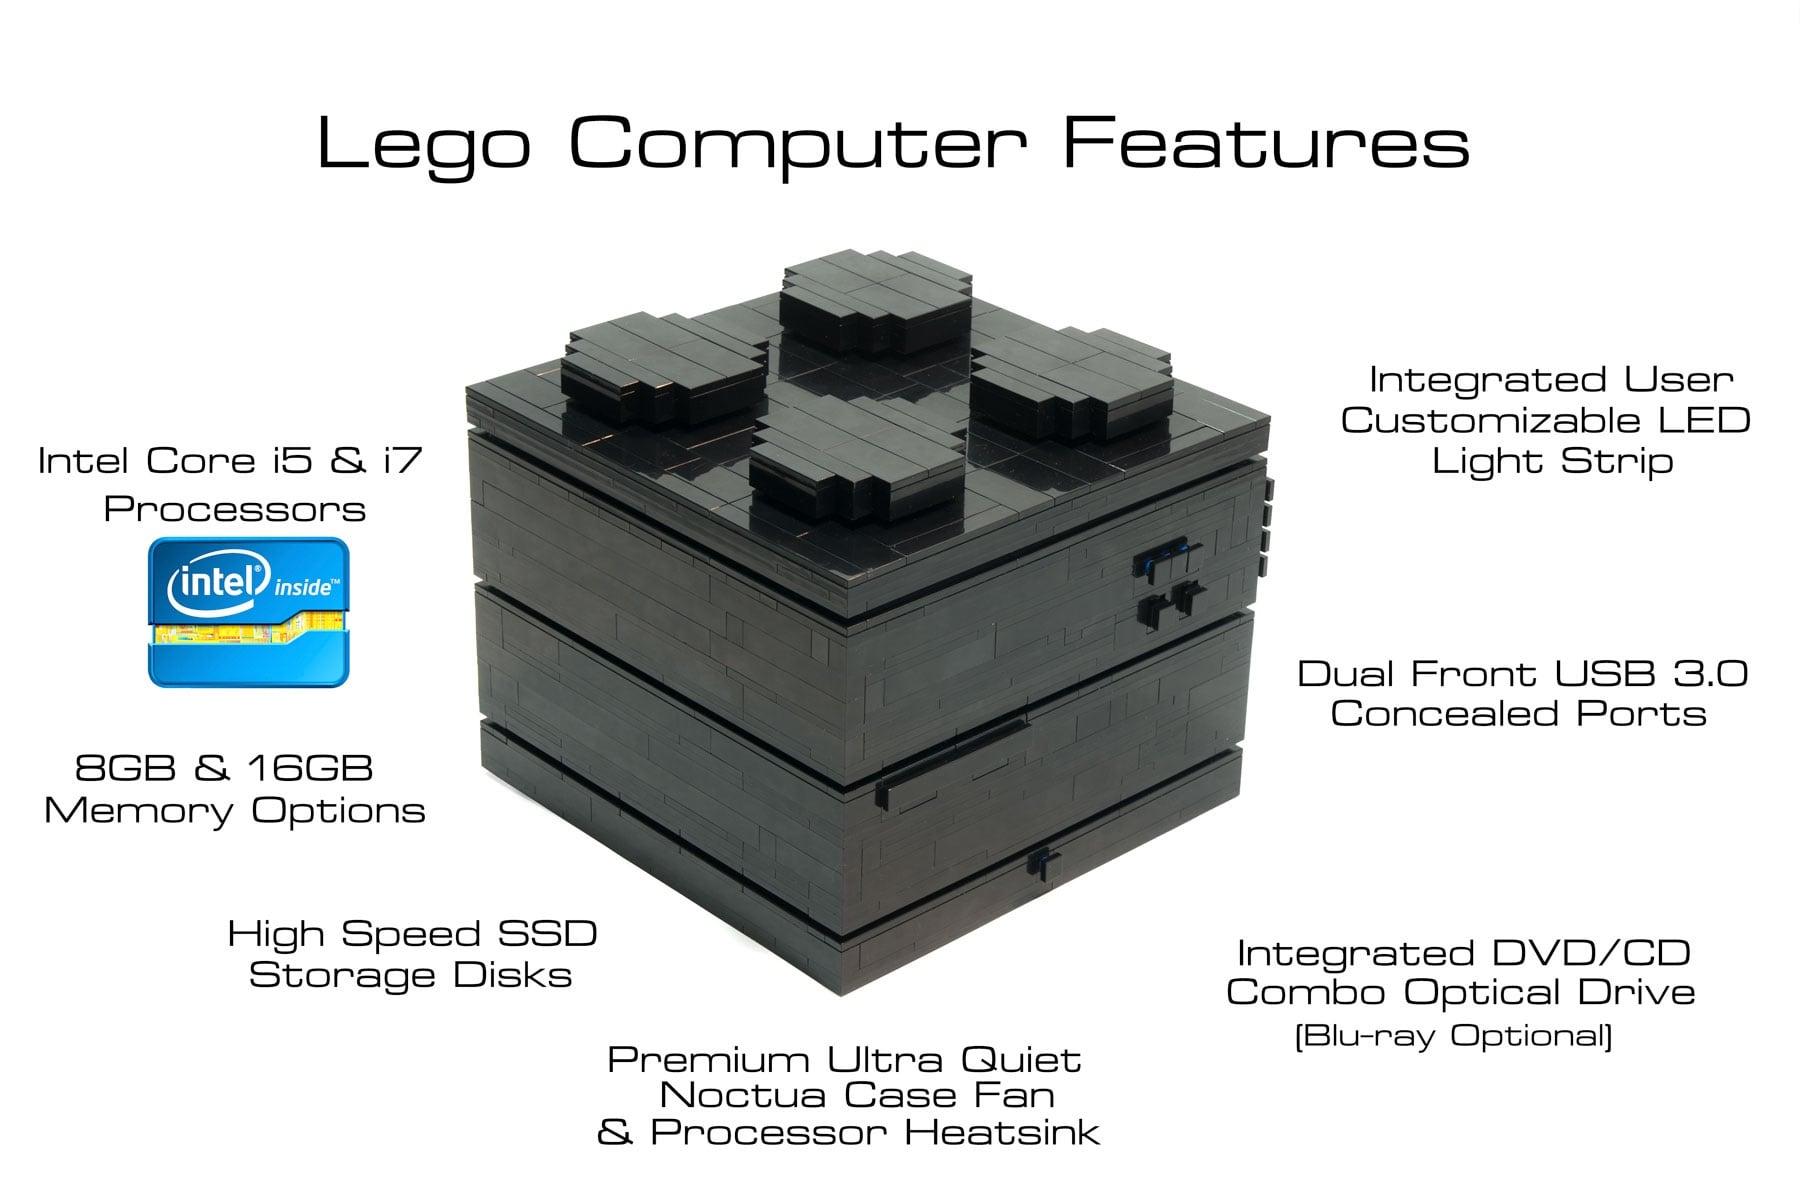 Lego computer configuration